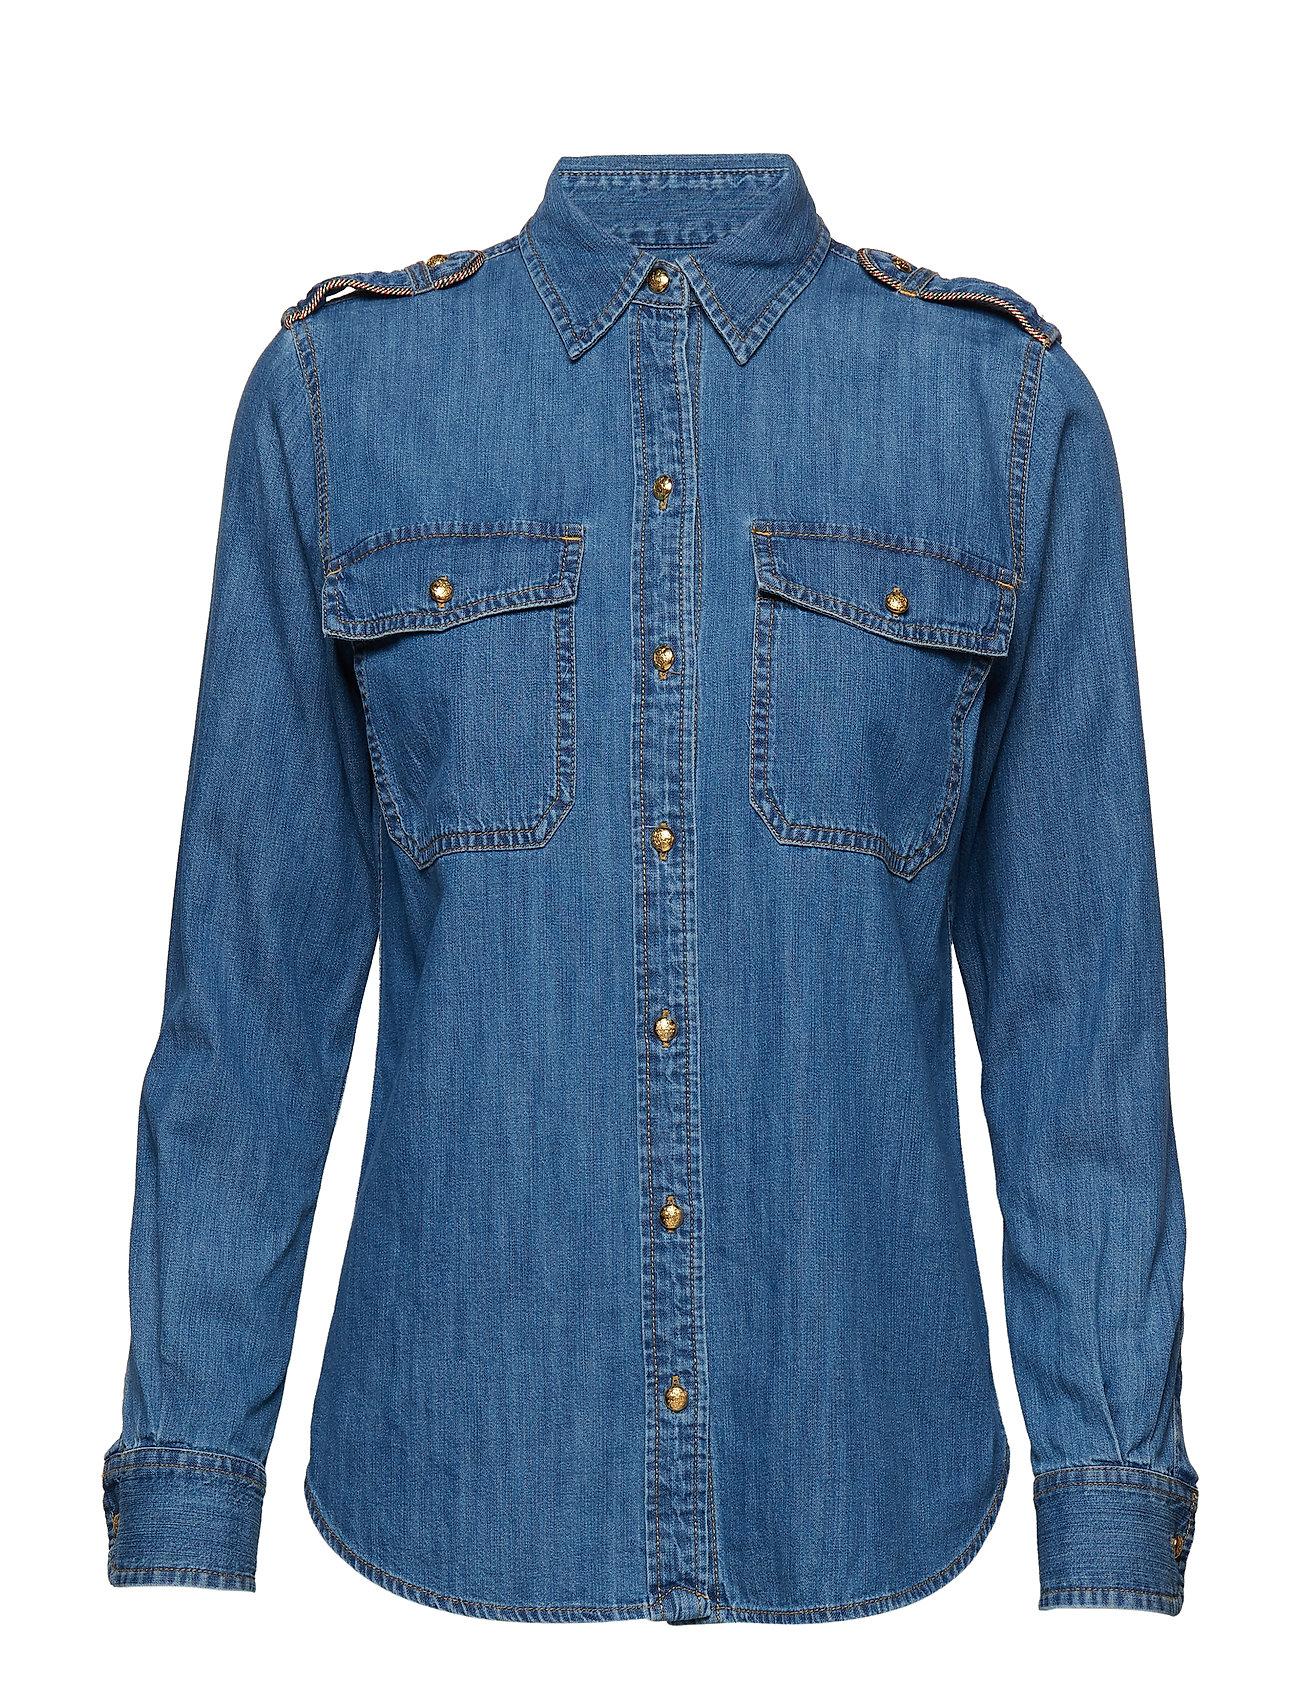 Lauren Ralph Lauren Epaulet Denim Shirt - INDIGO FLORA WASH